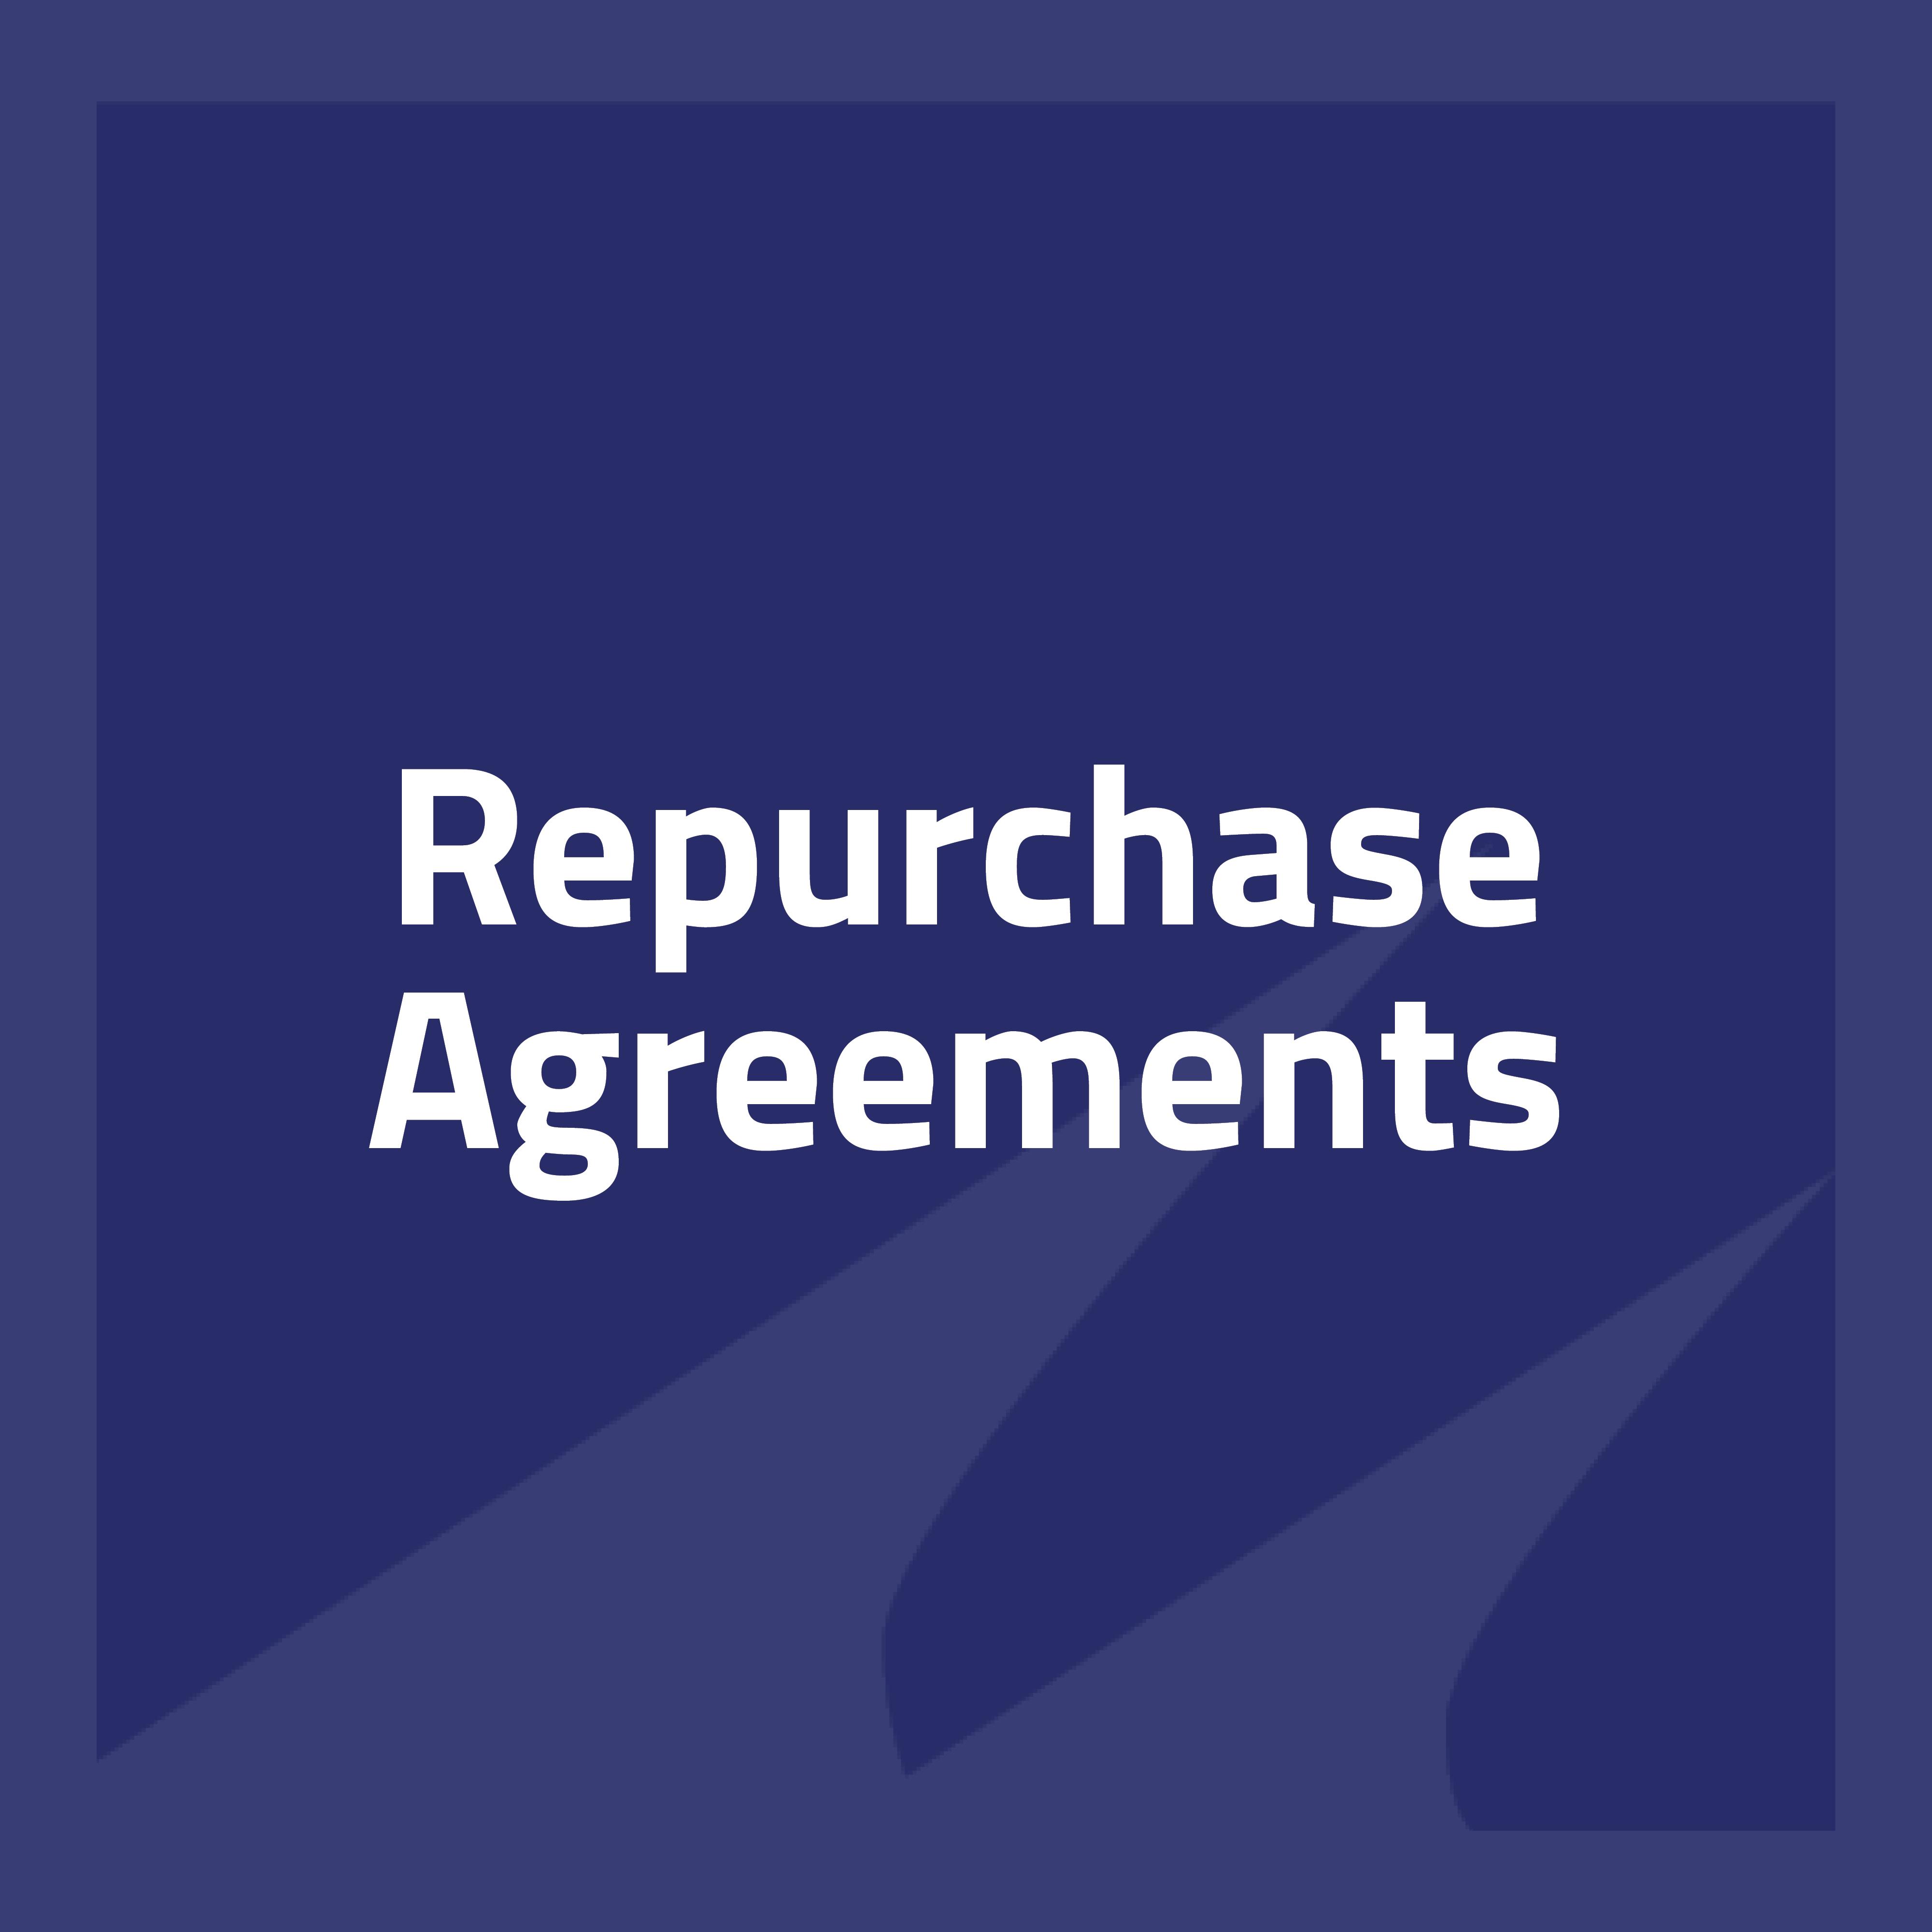 RepurchaseAgreements-1